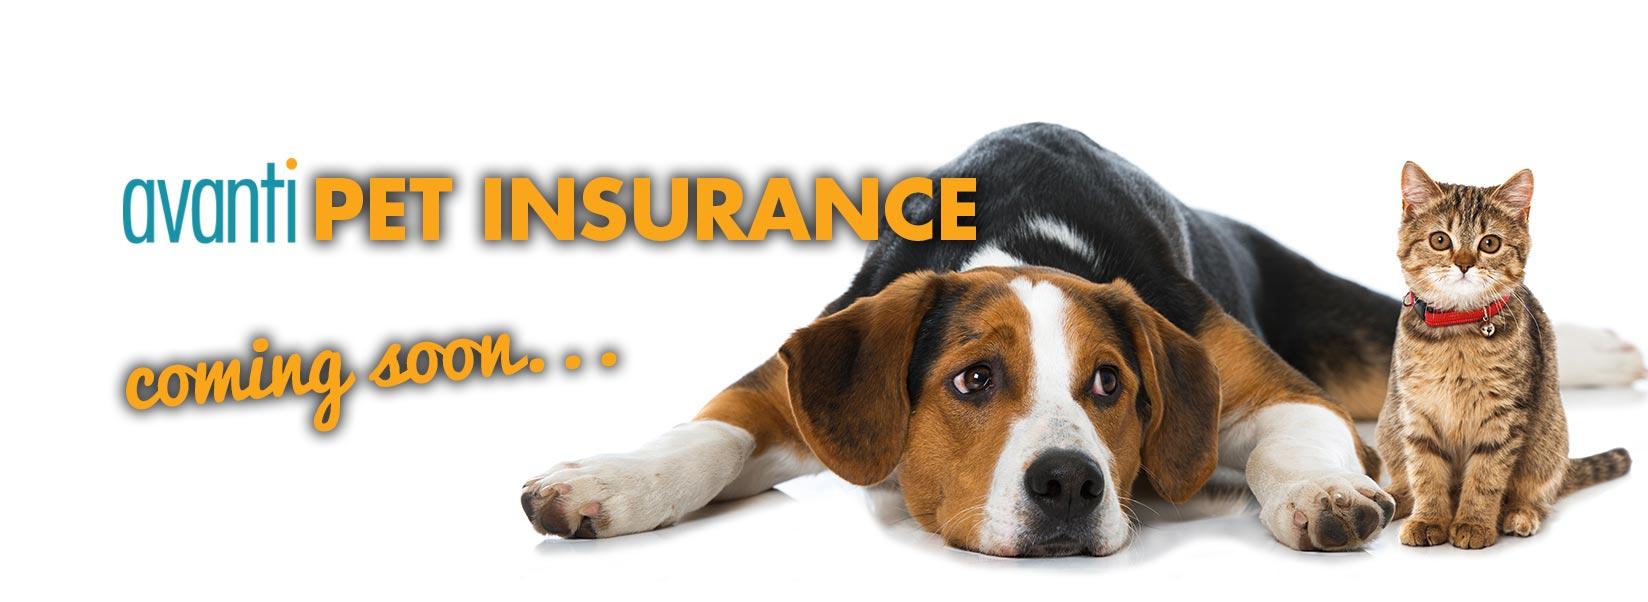 Pet Insurance coming soon